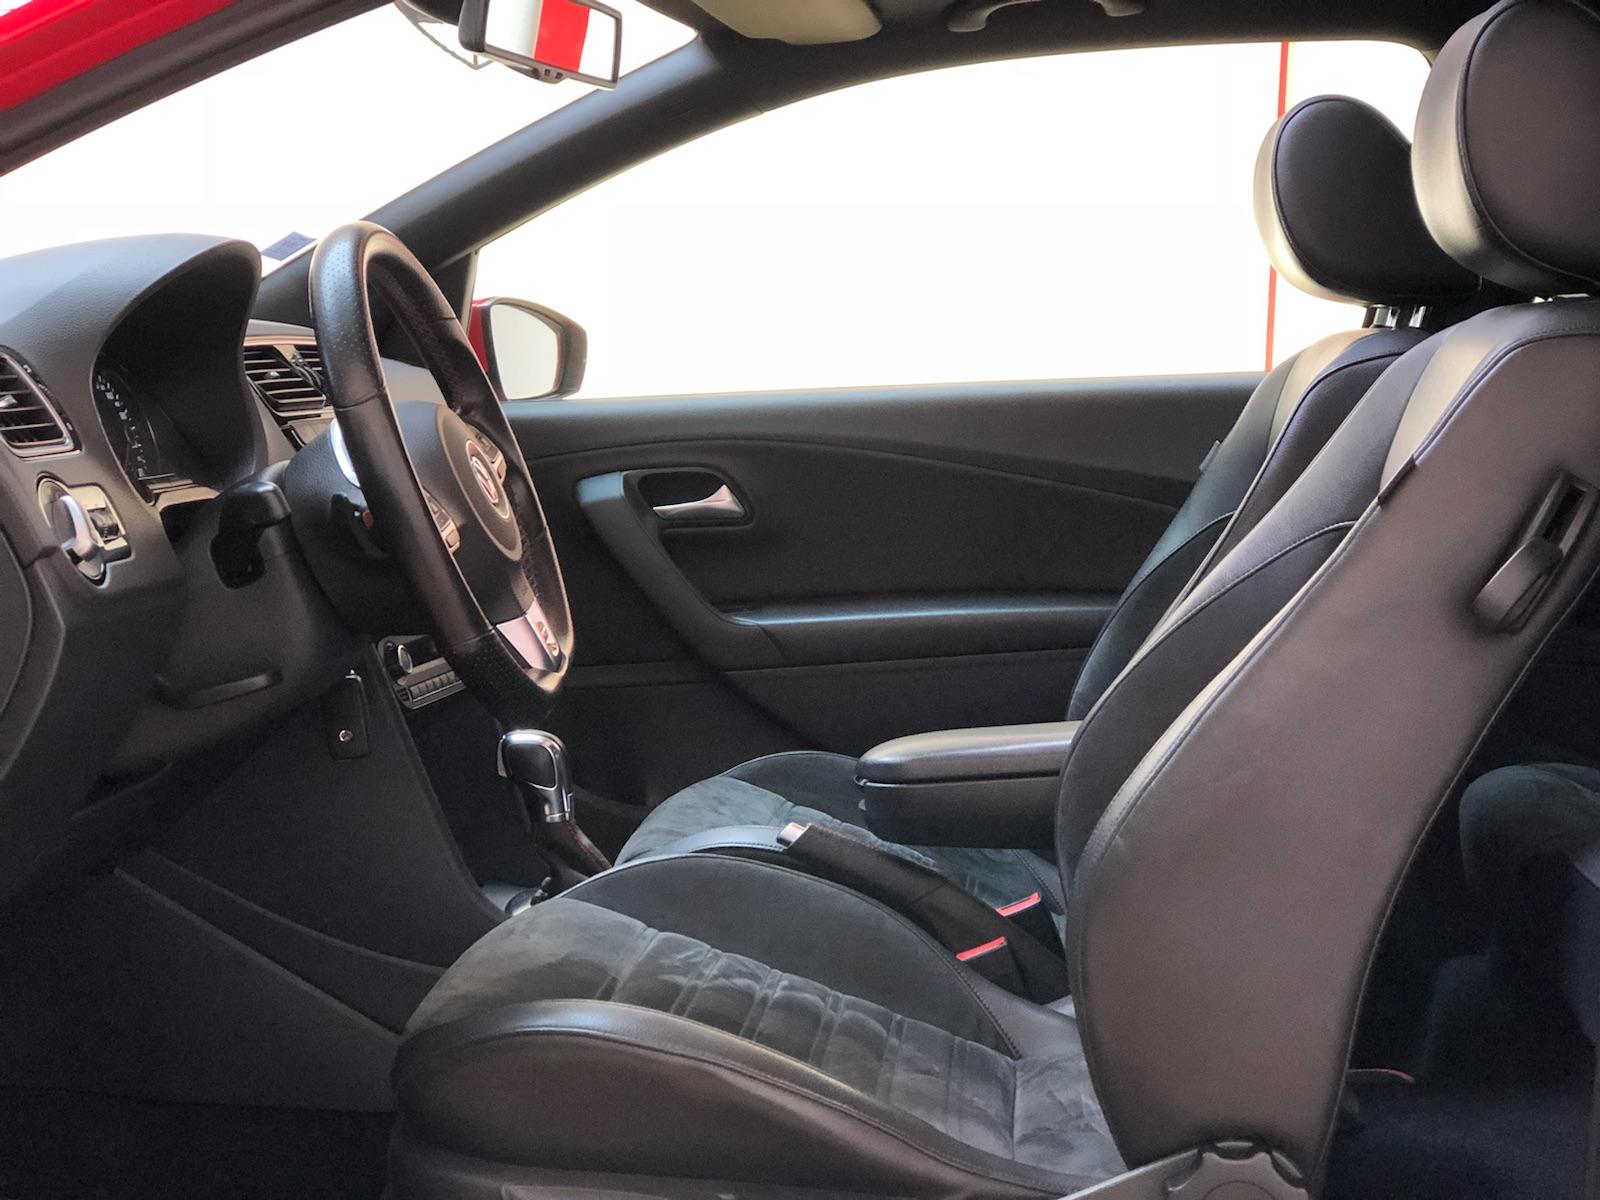 VW POLO GTI 1.4 180CH